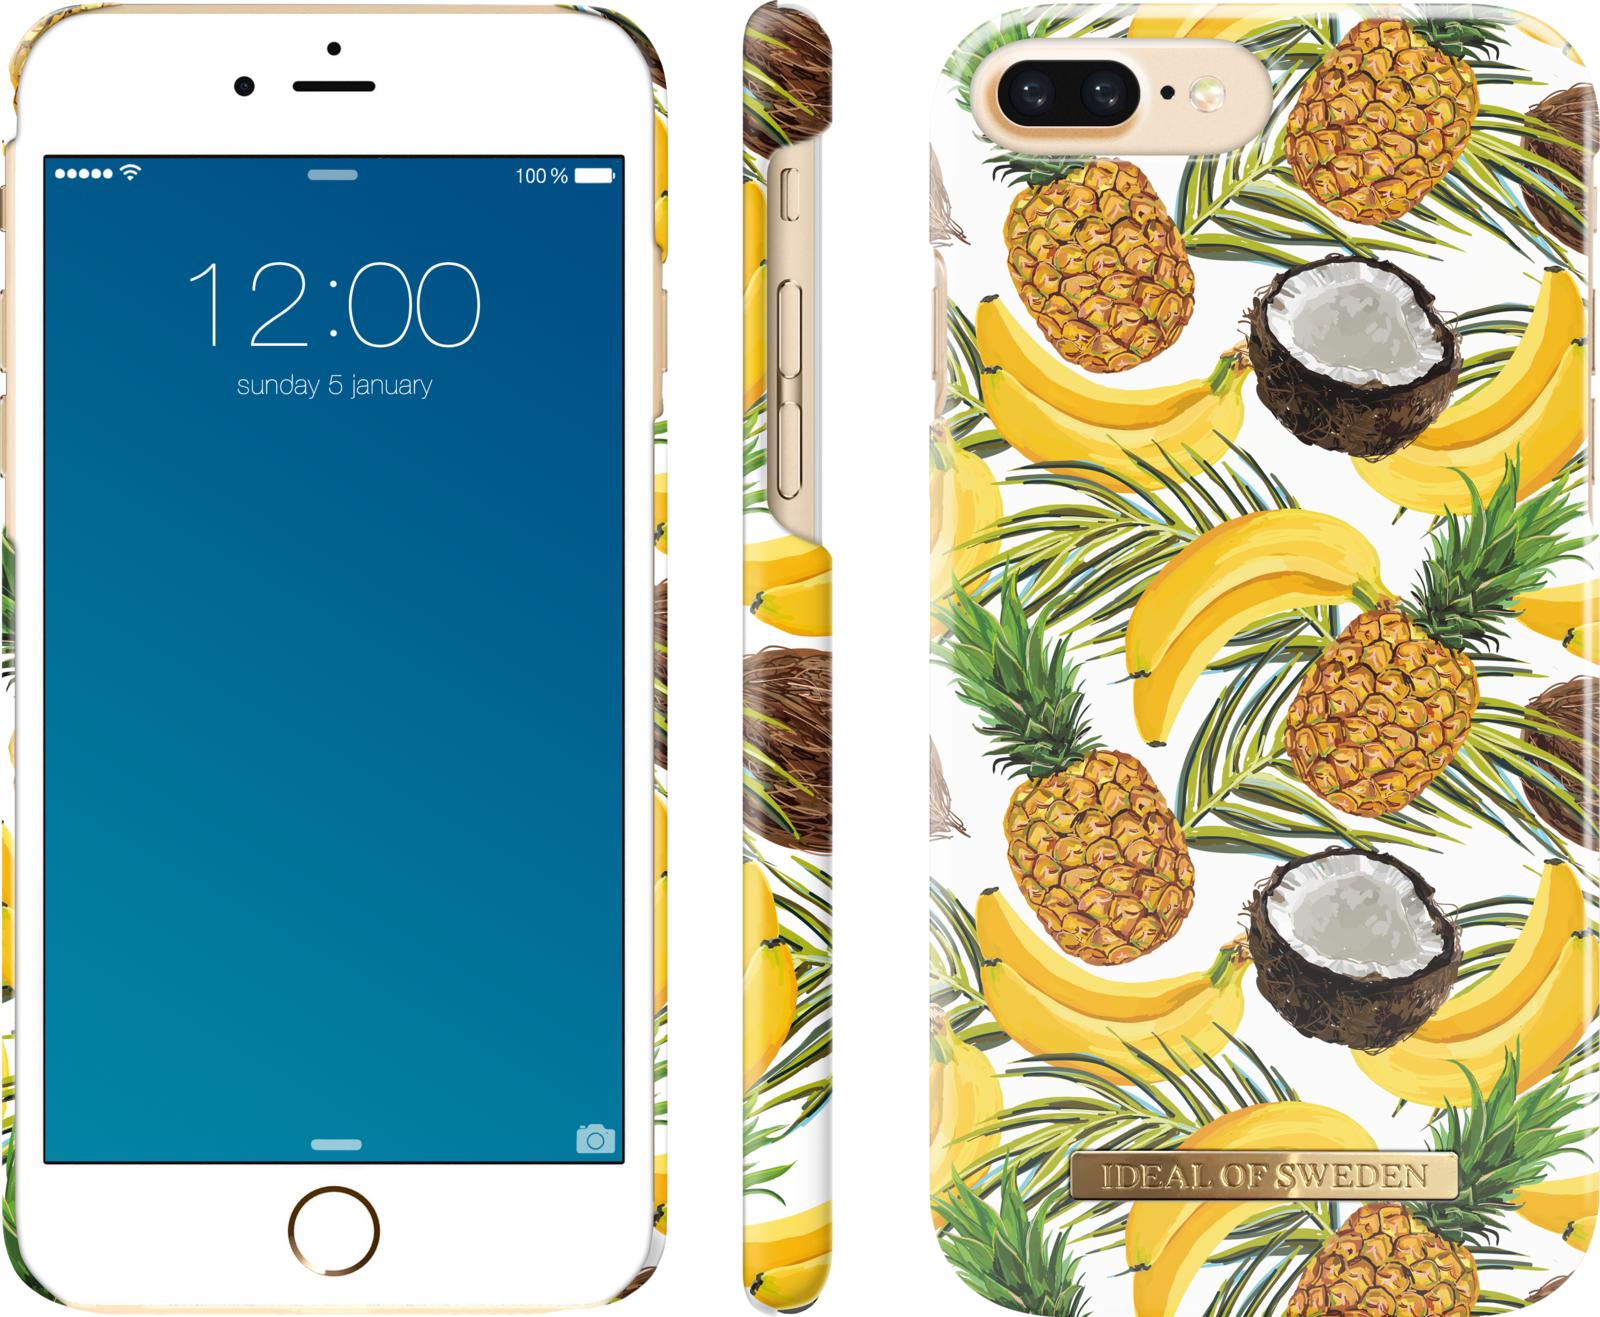 ideal of sweden banana coconut iphone 8 7 6 s plus. Black Bedroom Furniture Sets. Home Design Ideas